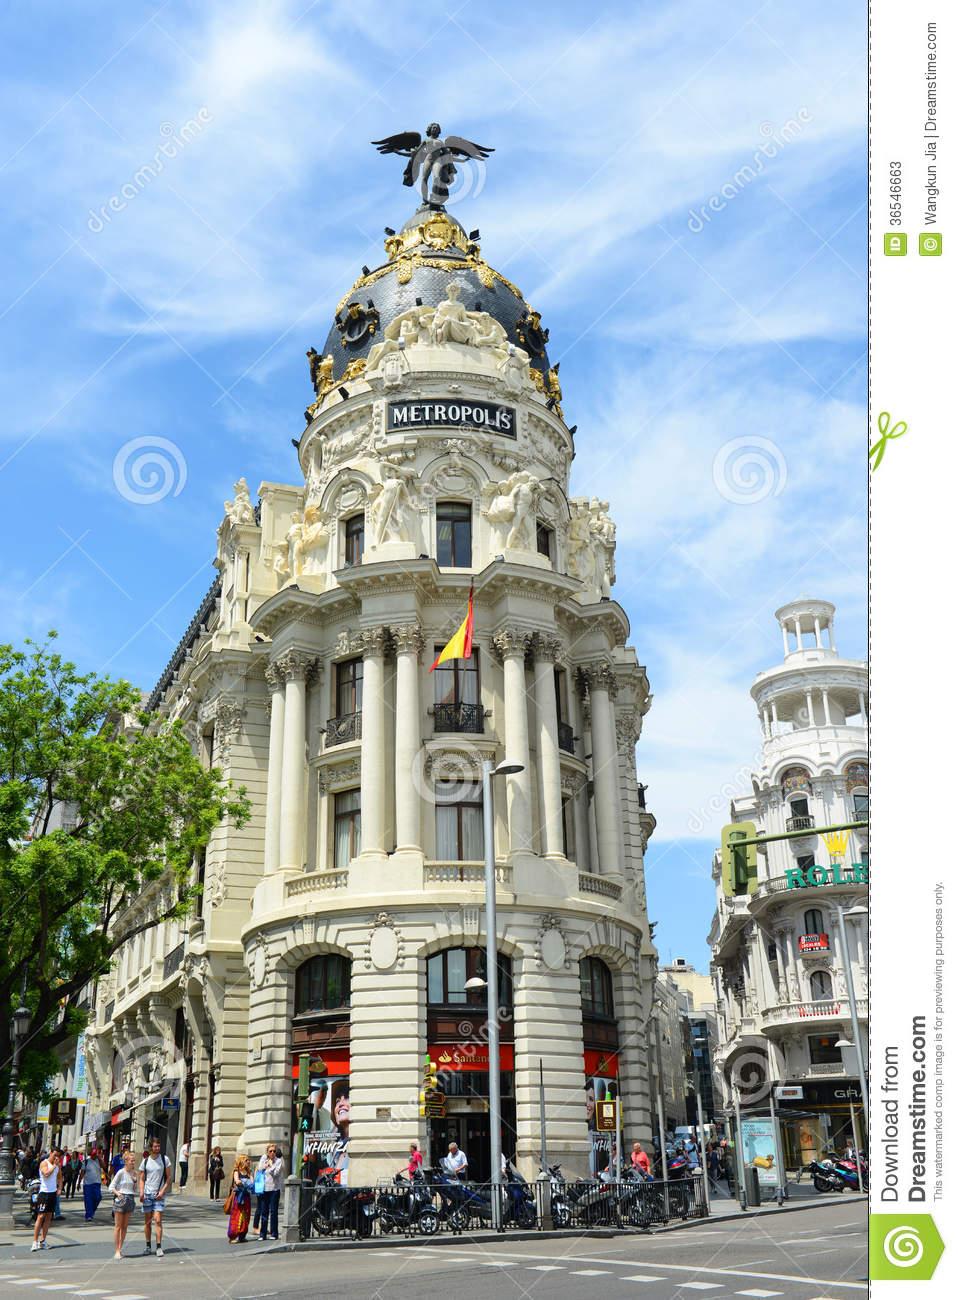 Metropolis Building, Madrid, Spain Editorial Stock Photo.